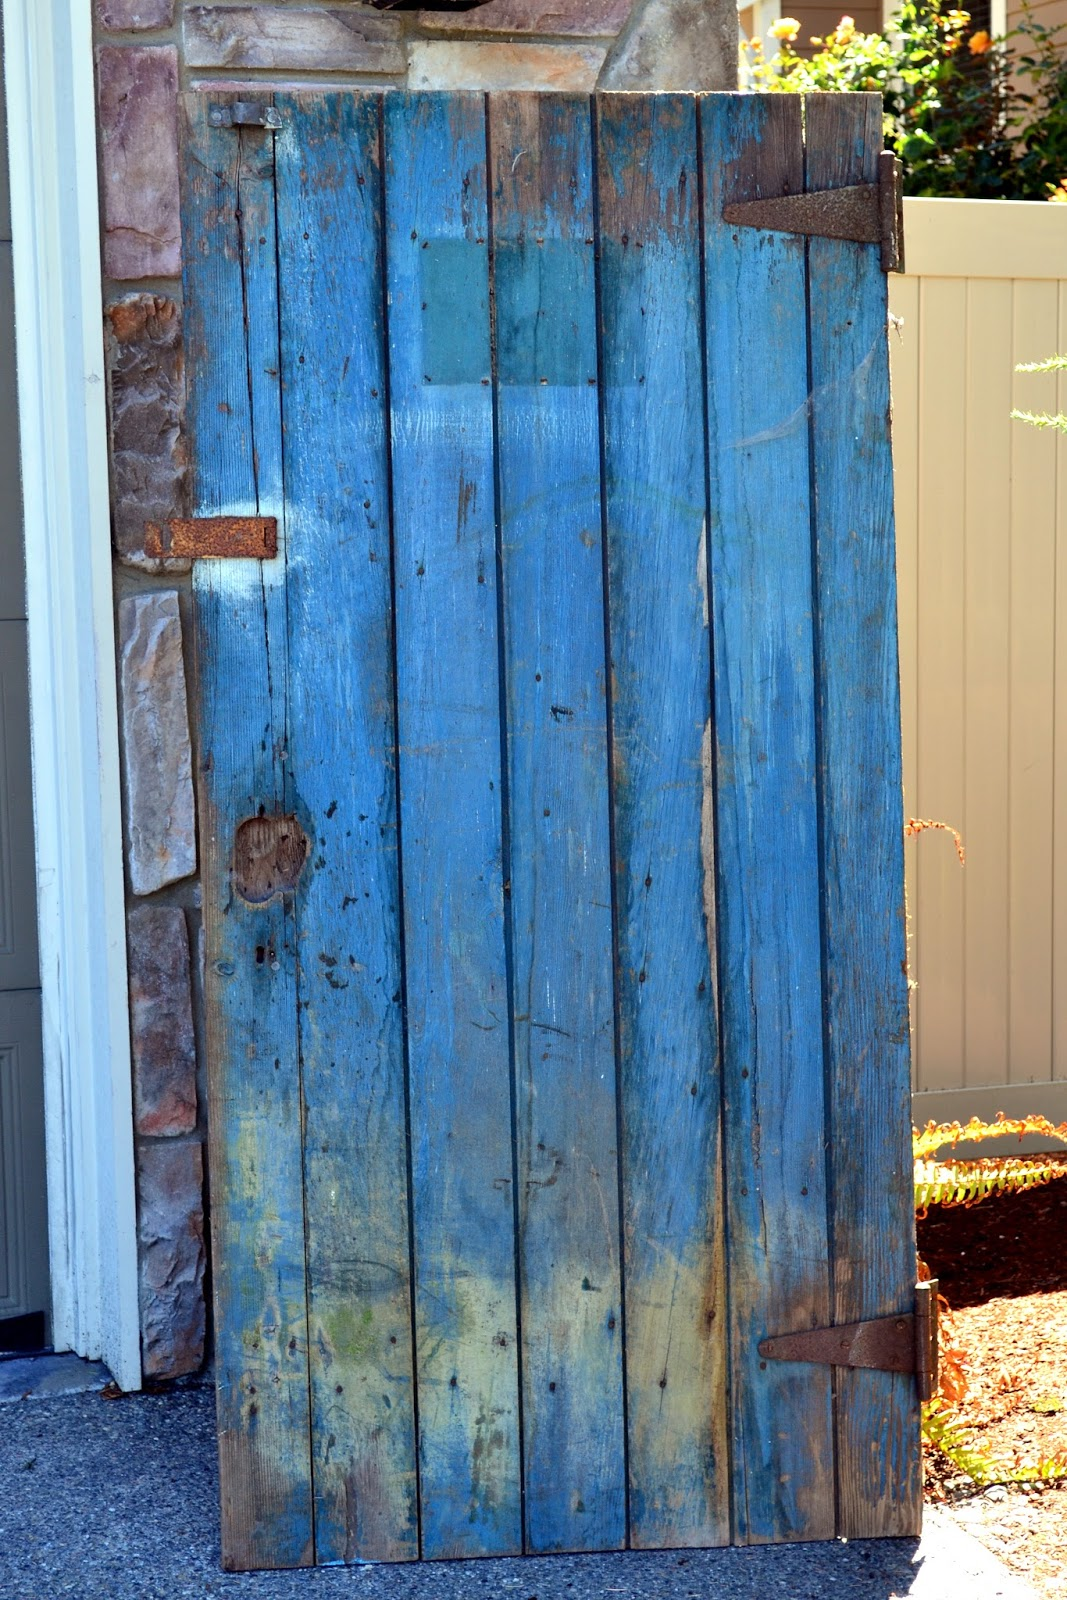 Garage Sale Finds Friday-the week I find rusty vintage stuff ...